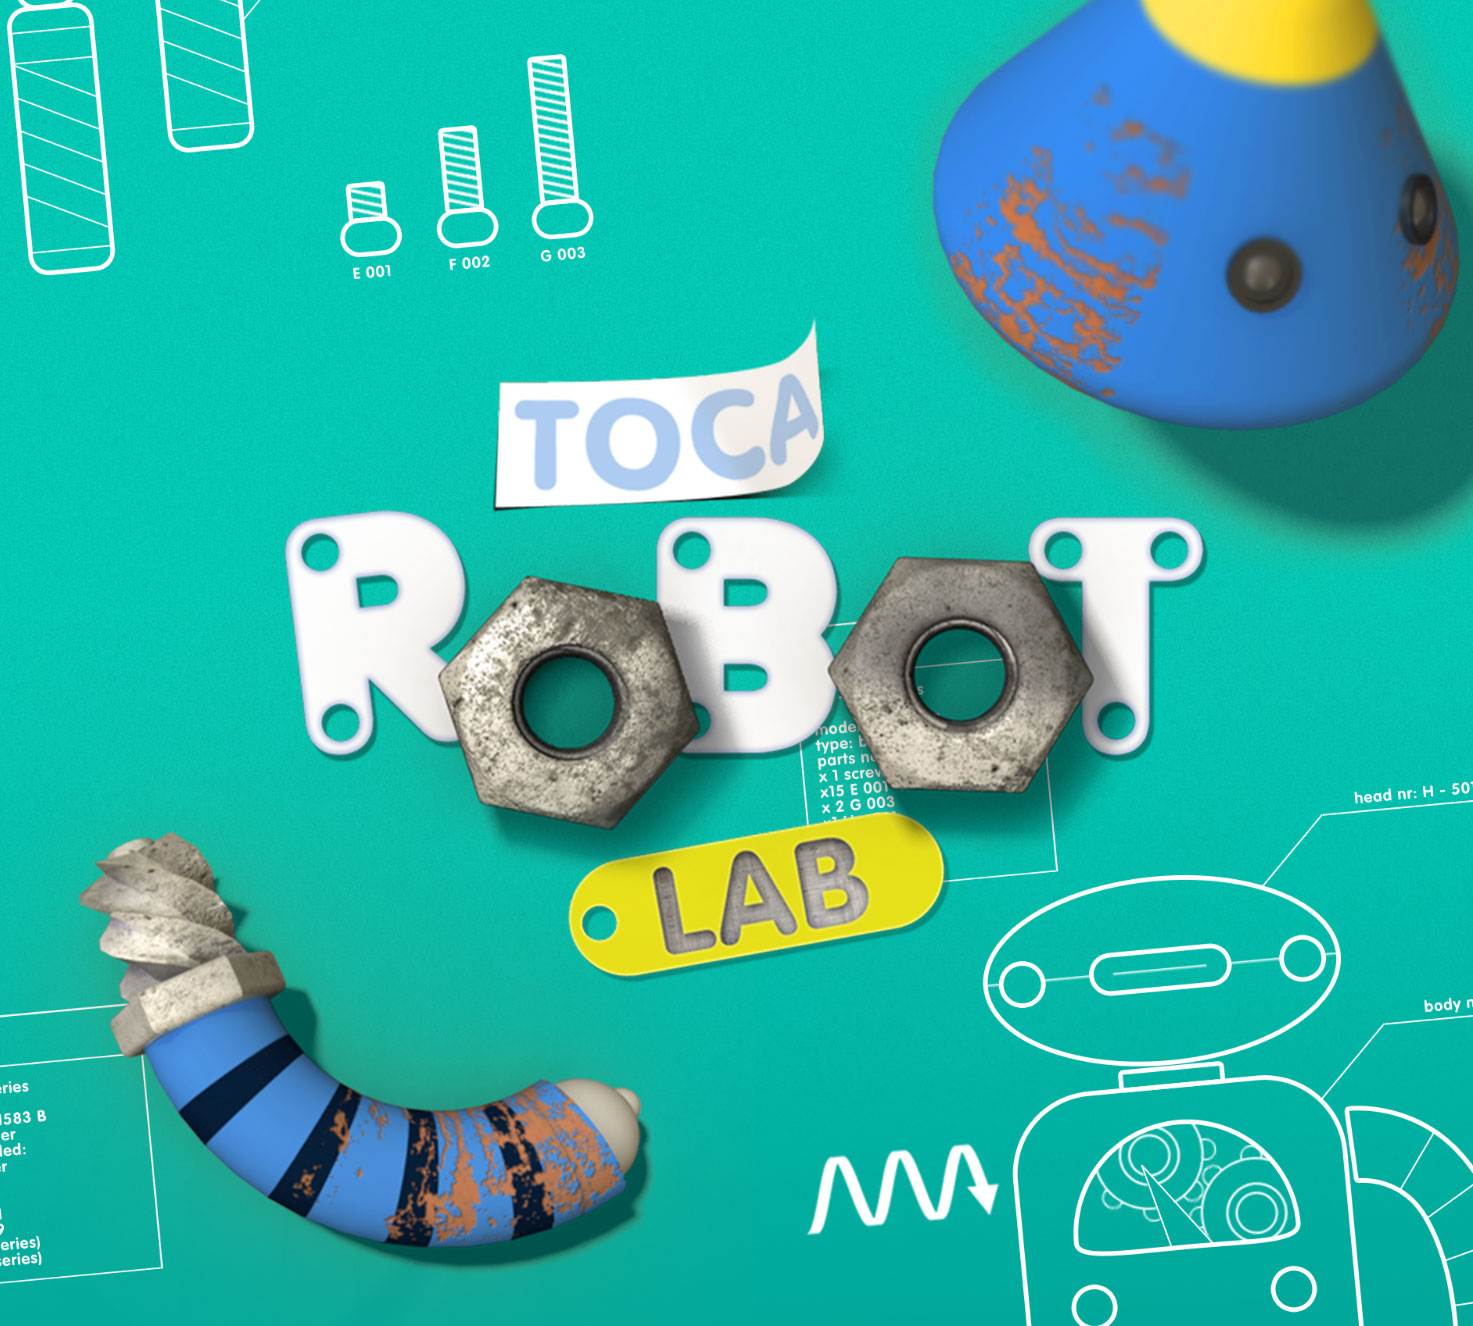 Toca Robot Lab para iOS